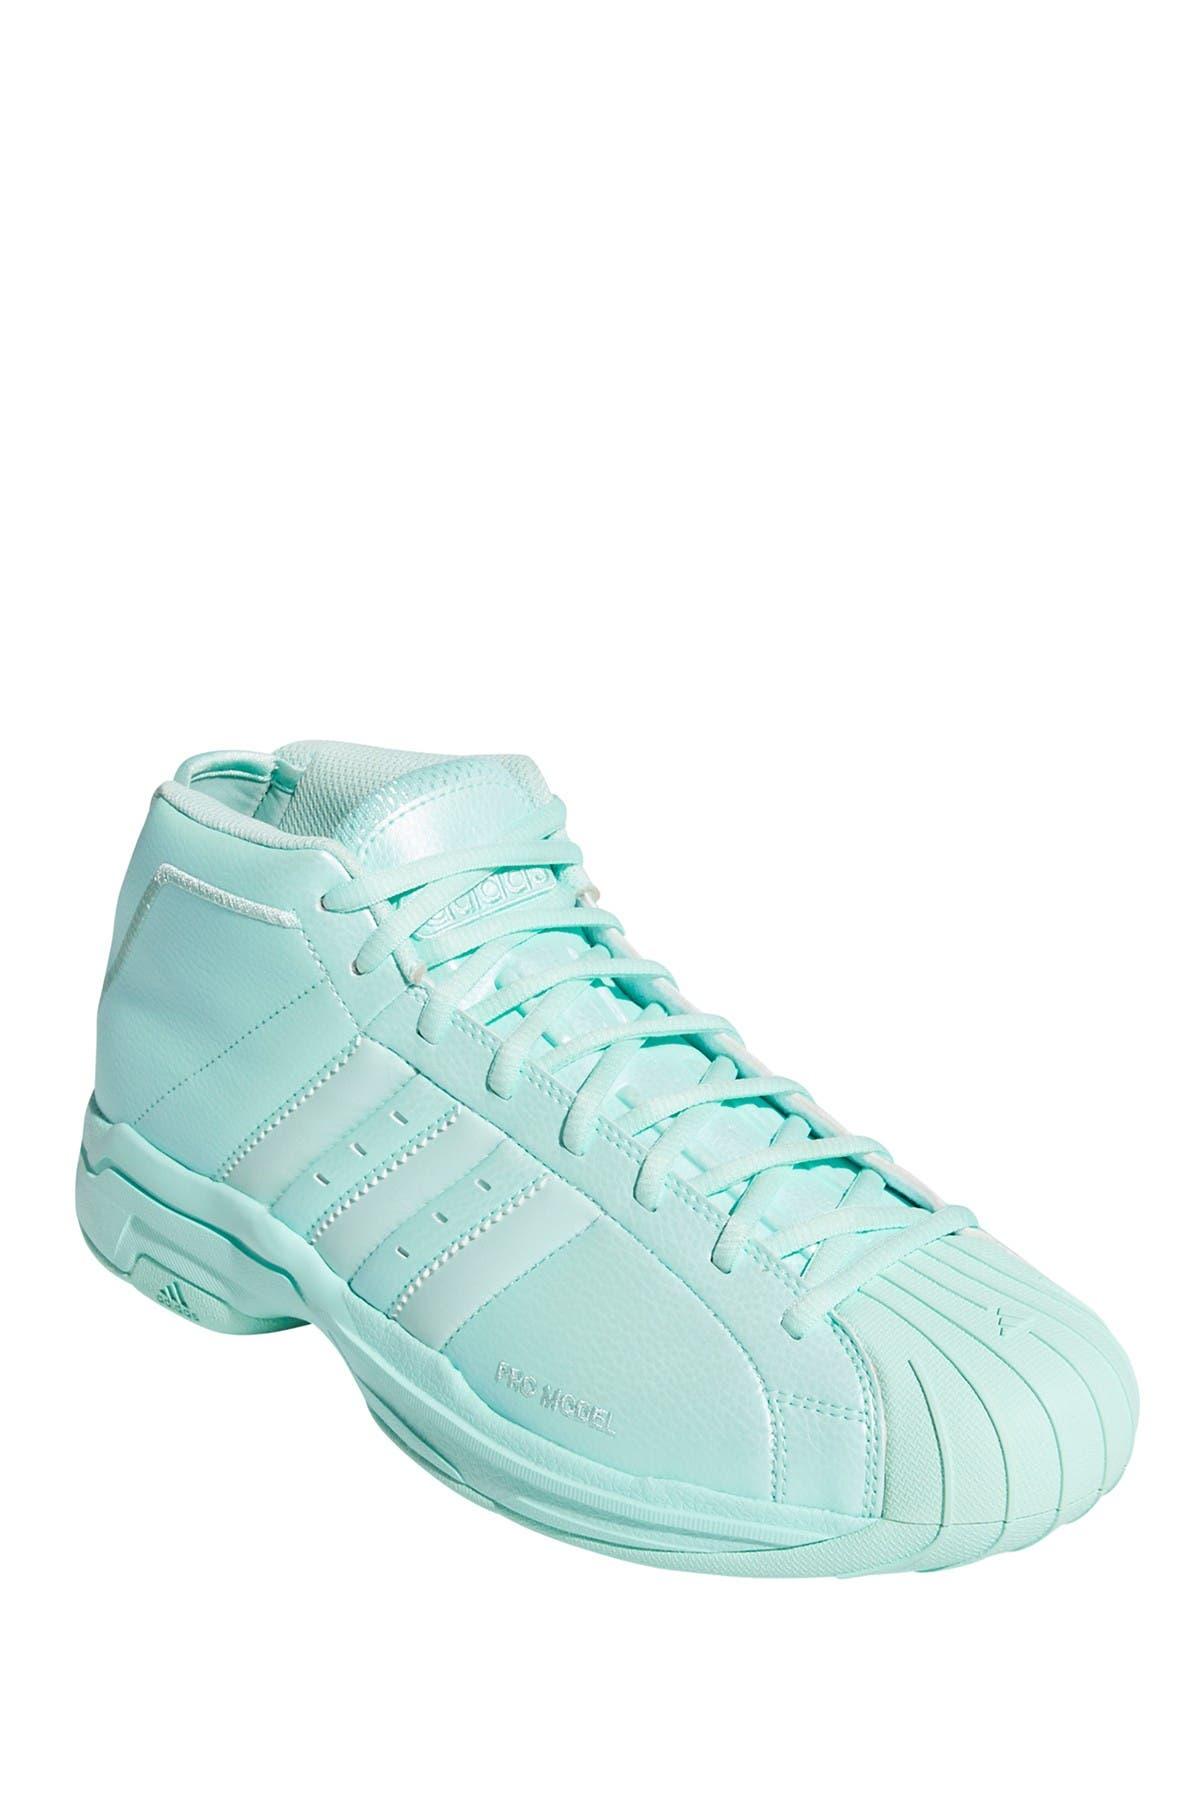 Image of adidas Pro Model 2G Sneaker